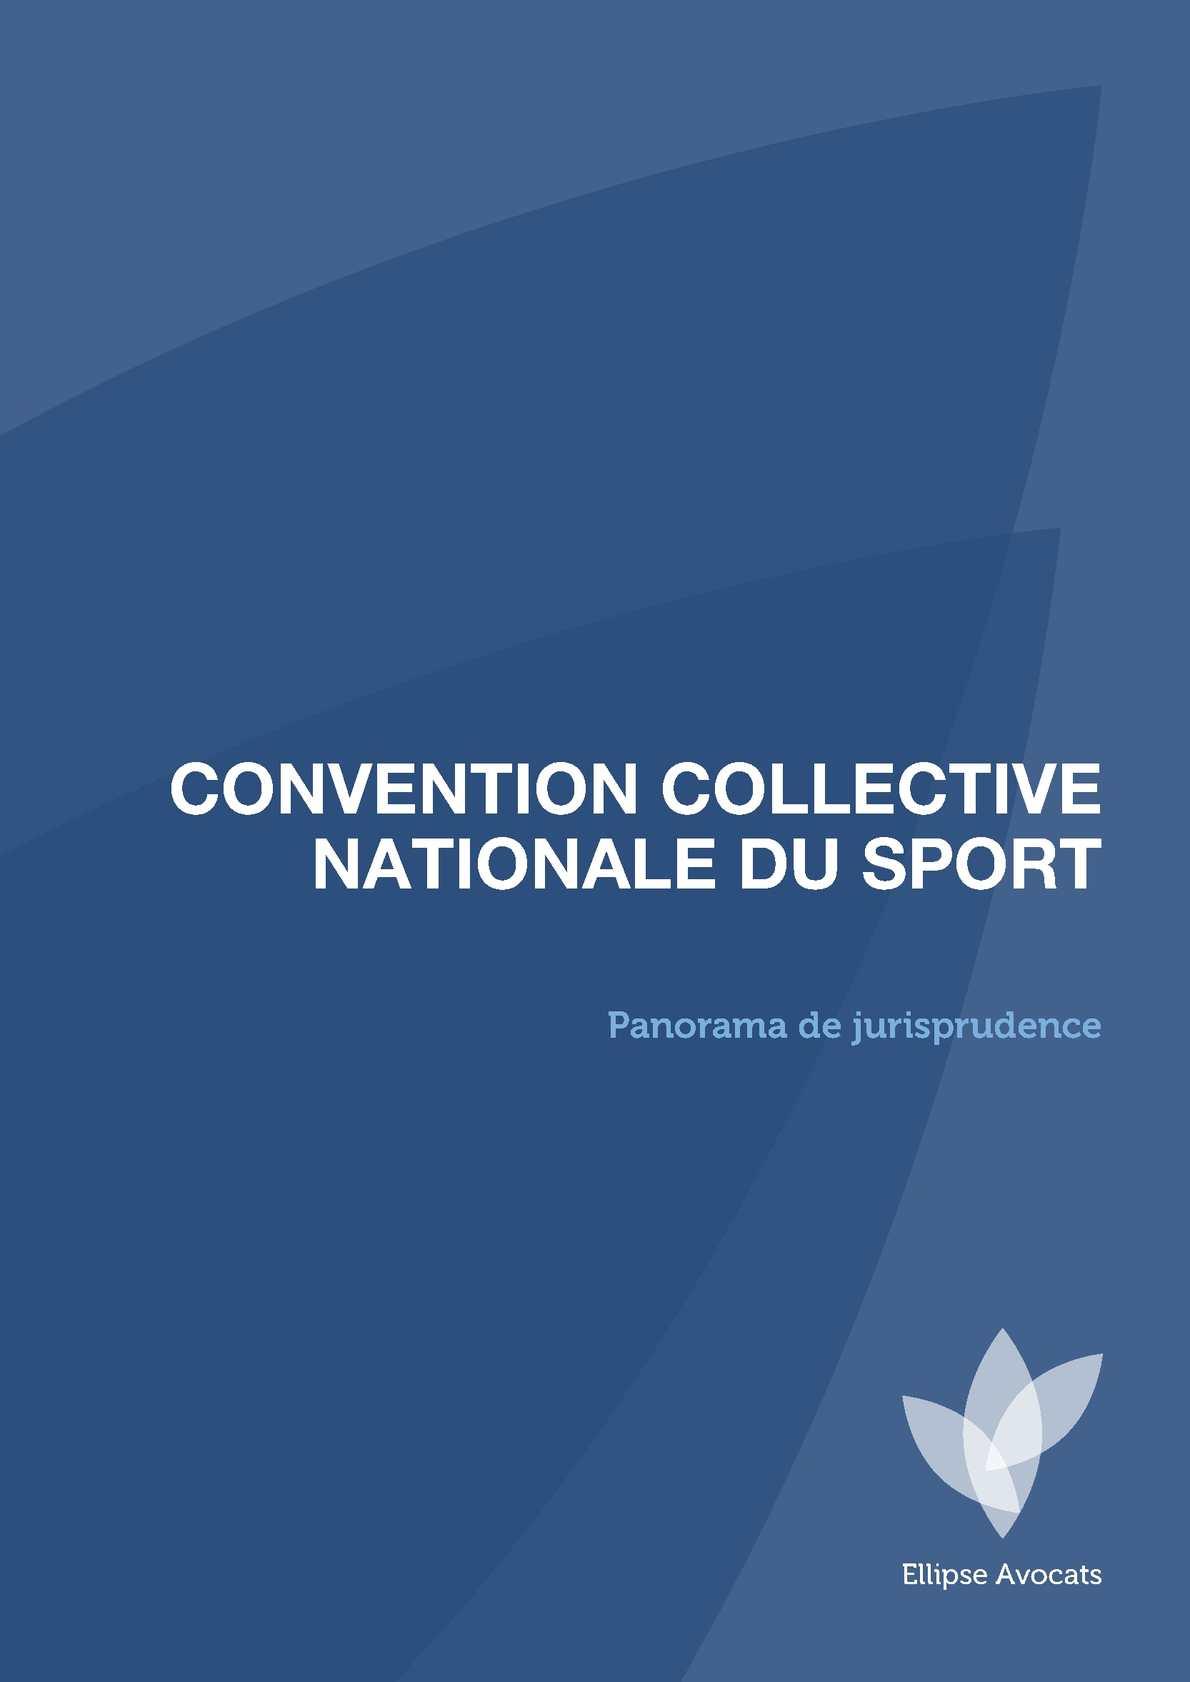 calam 233 o panorama de jurisprudence convention collective nationale du sport